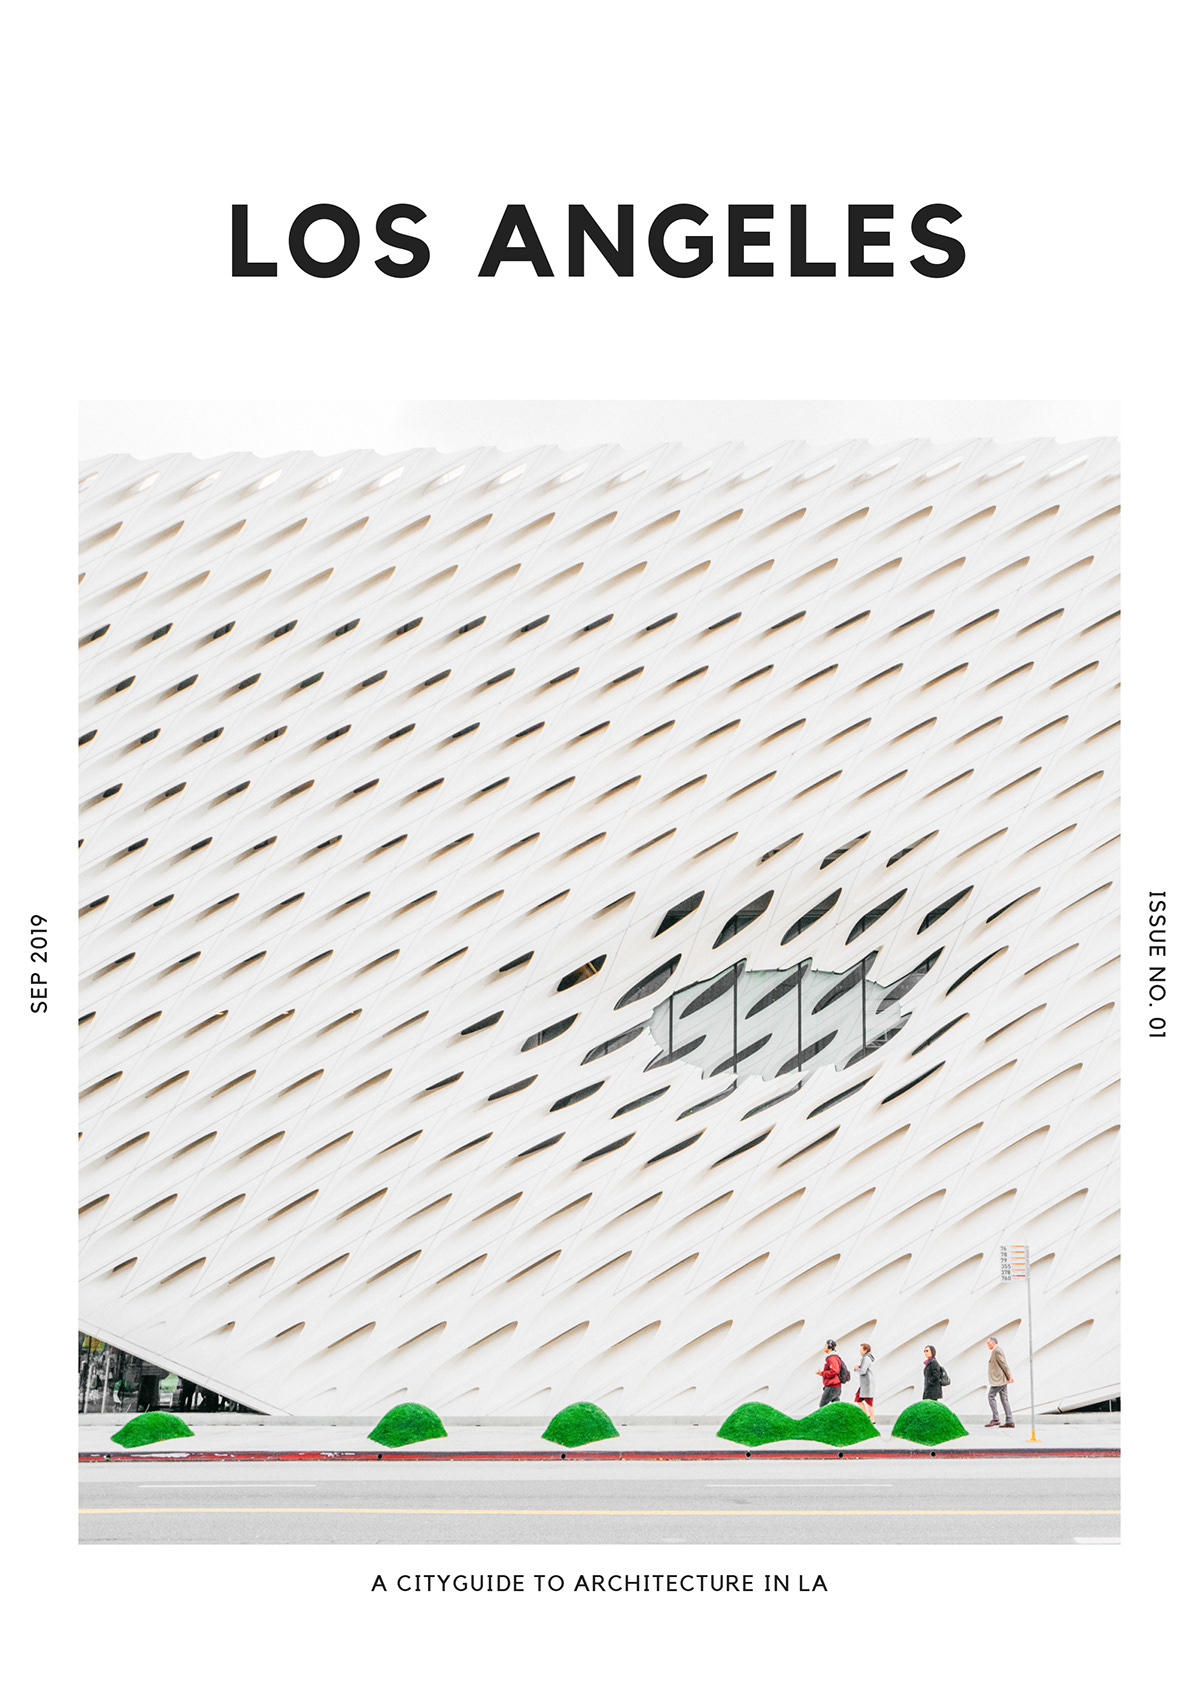 Cityguide Los Angeles Lalaland cityguide la LA architecture los angeles architecture best la architecture